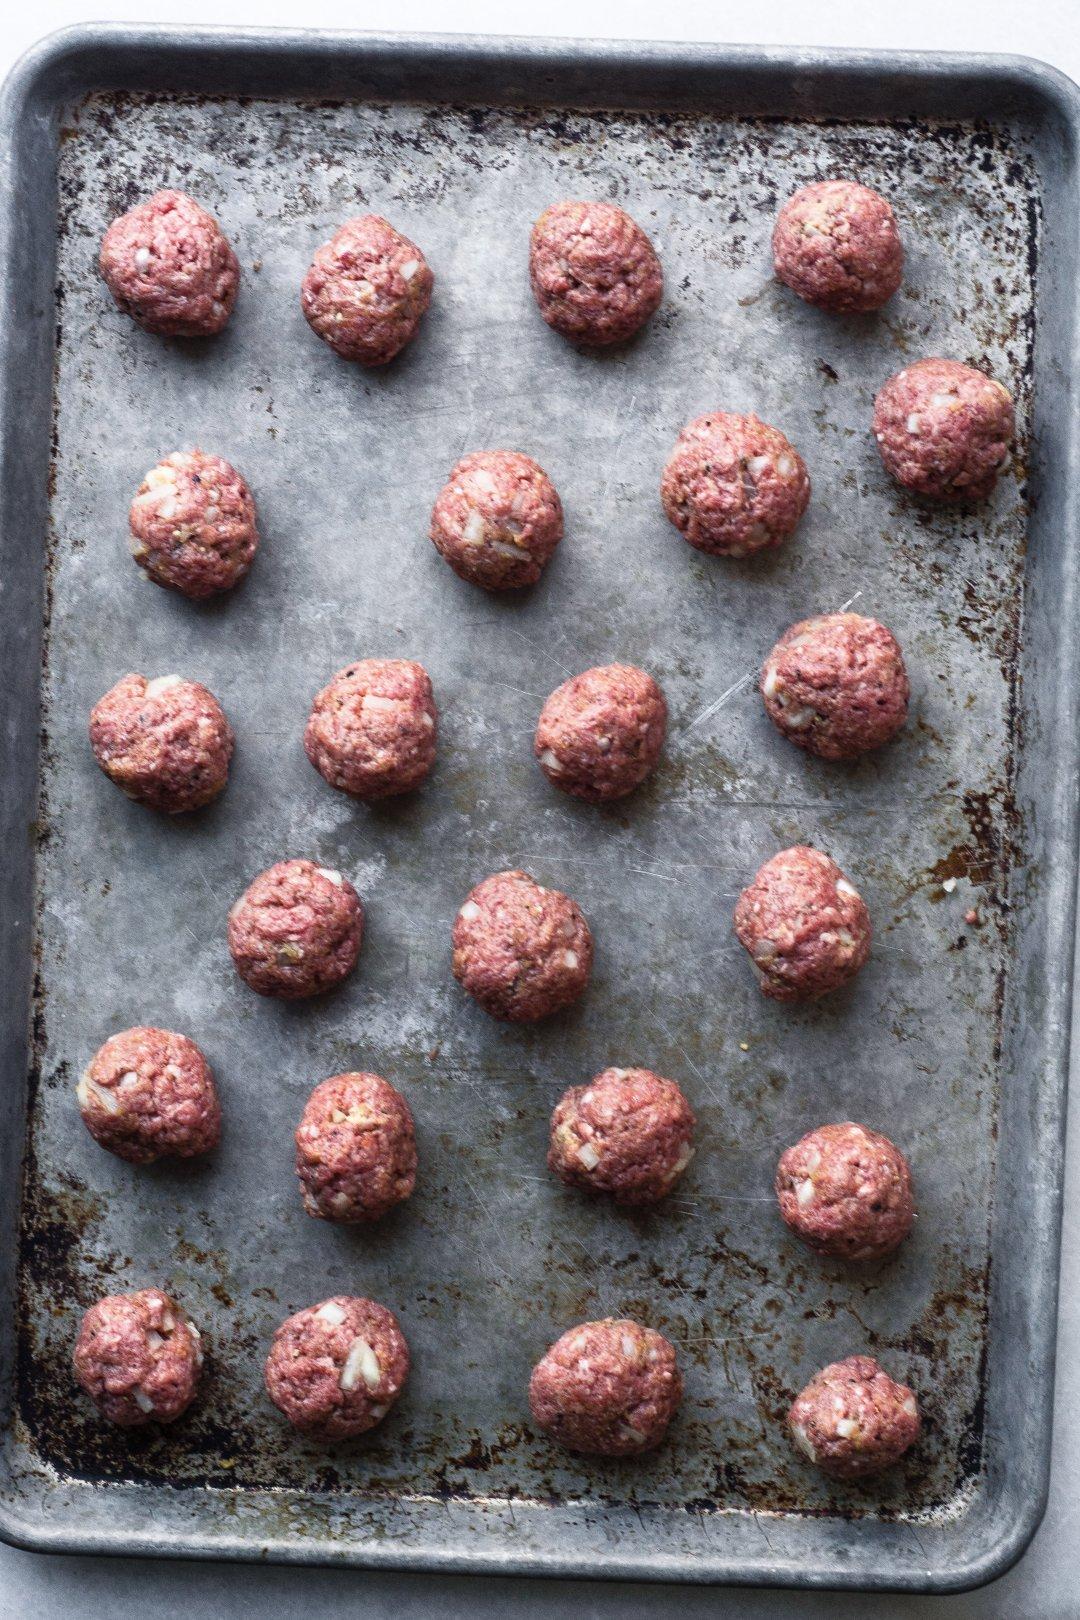 a tray of Salisbury meatballs ready to bake